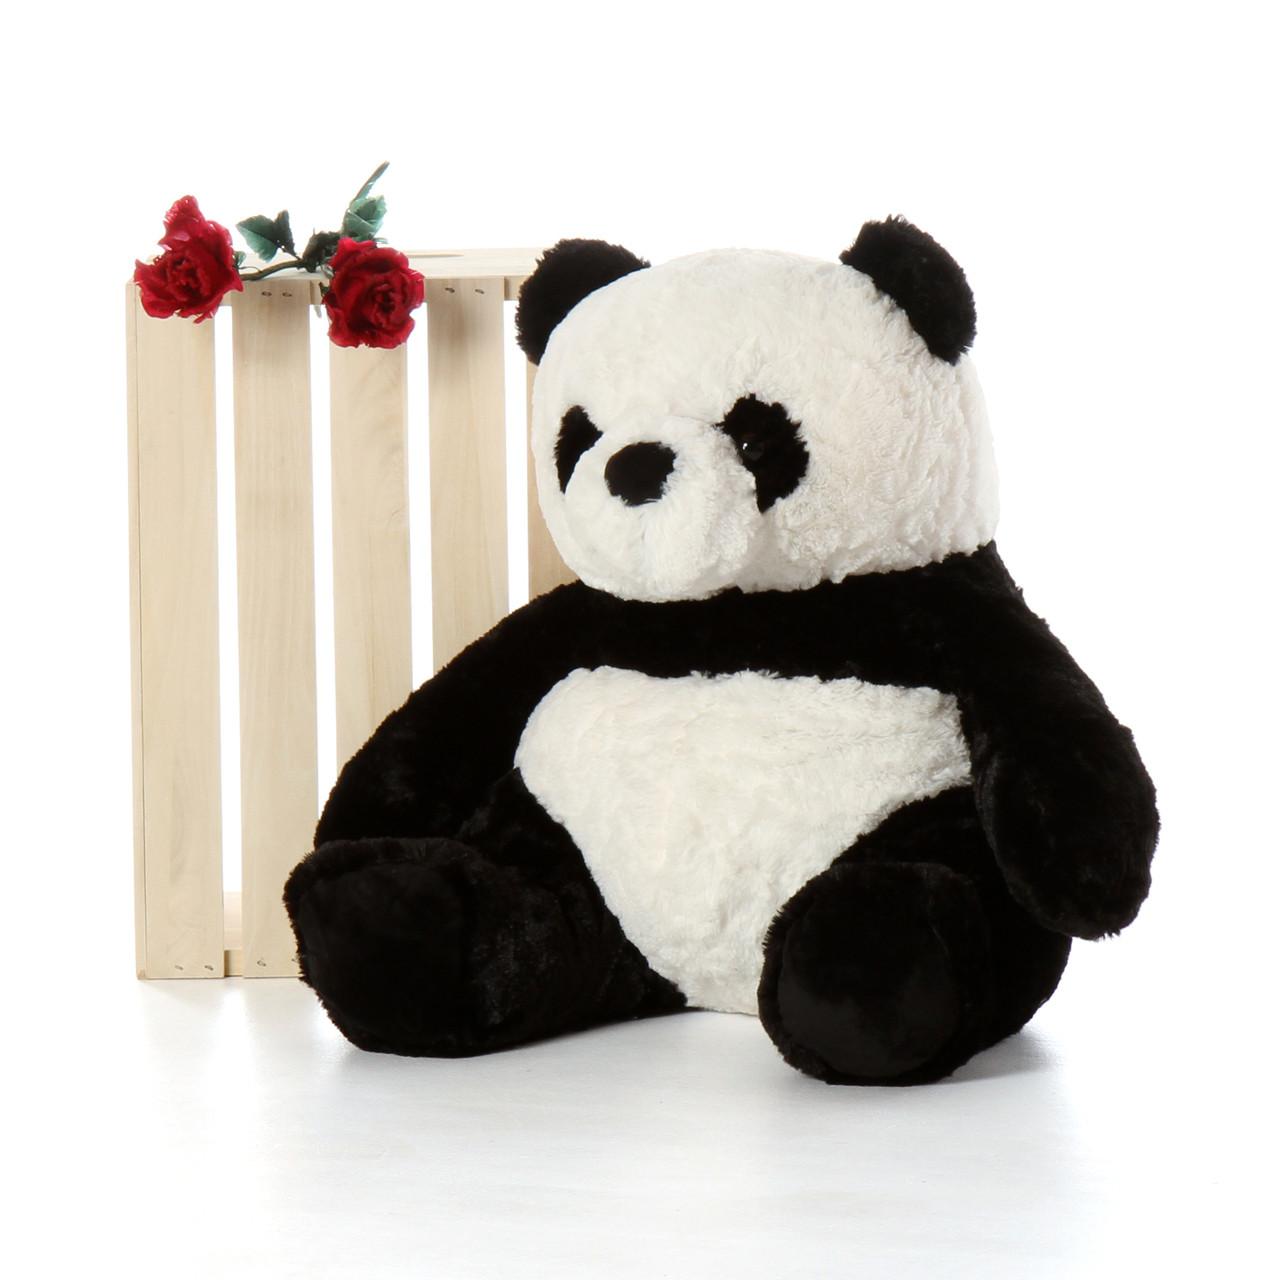 24 inch Sitting Panda Bear by Giant Teddy Brand